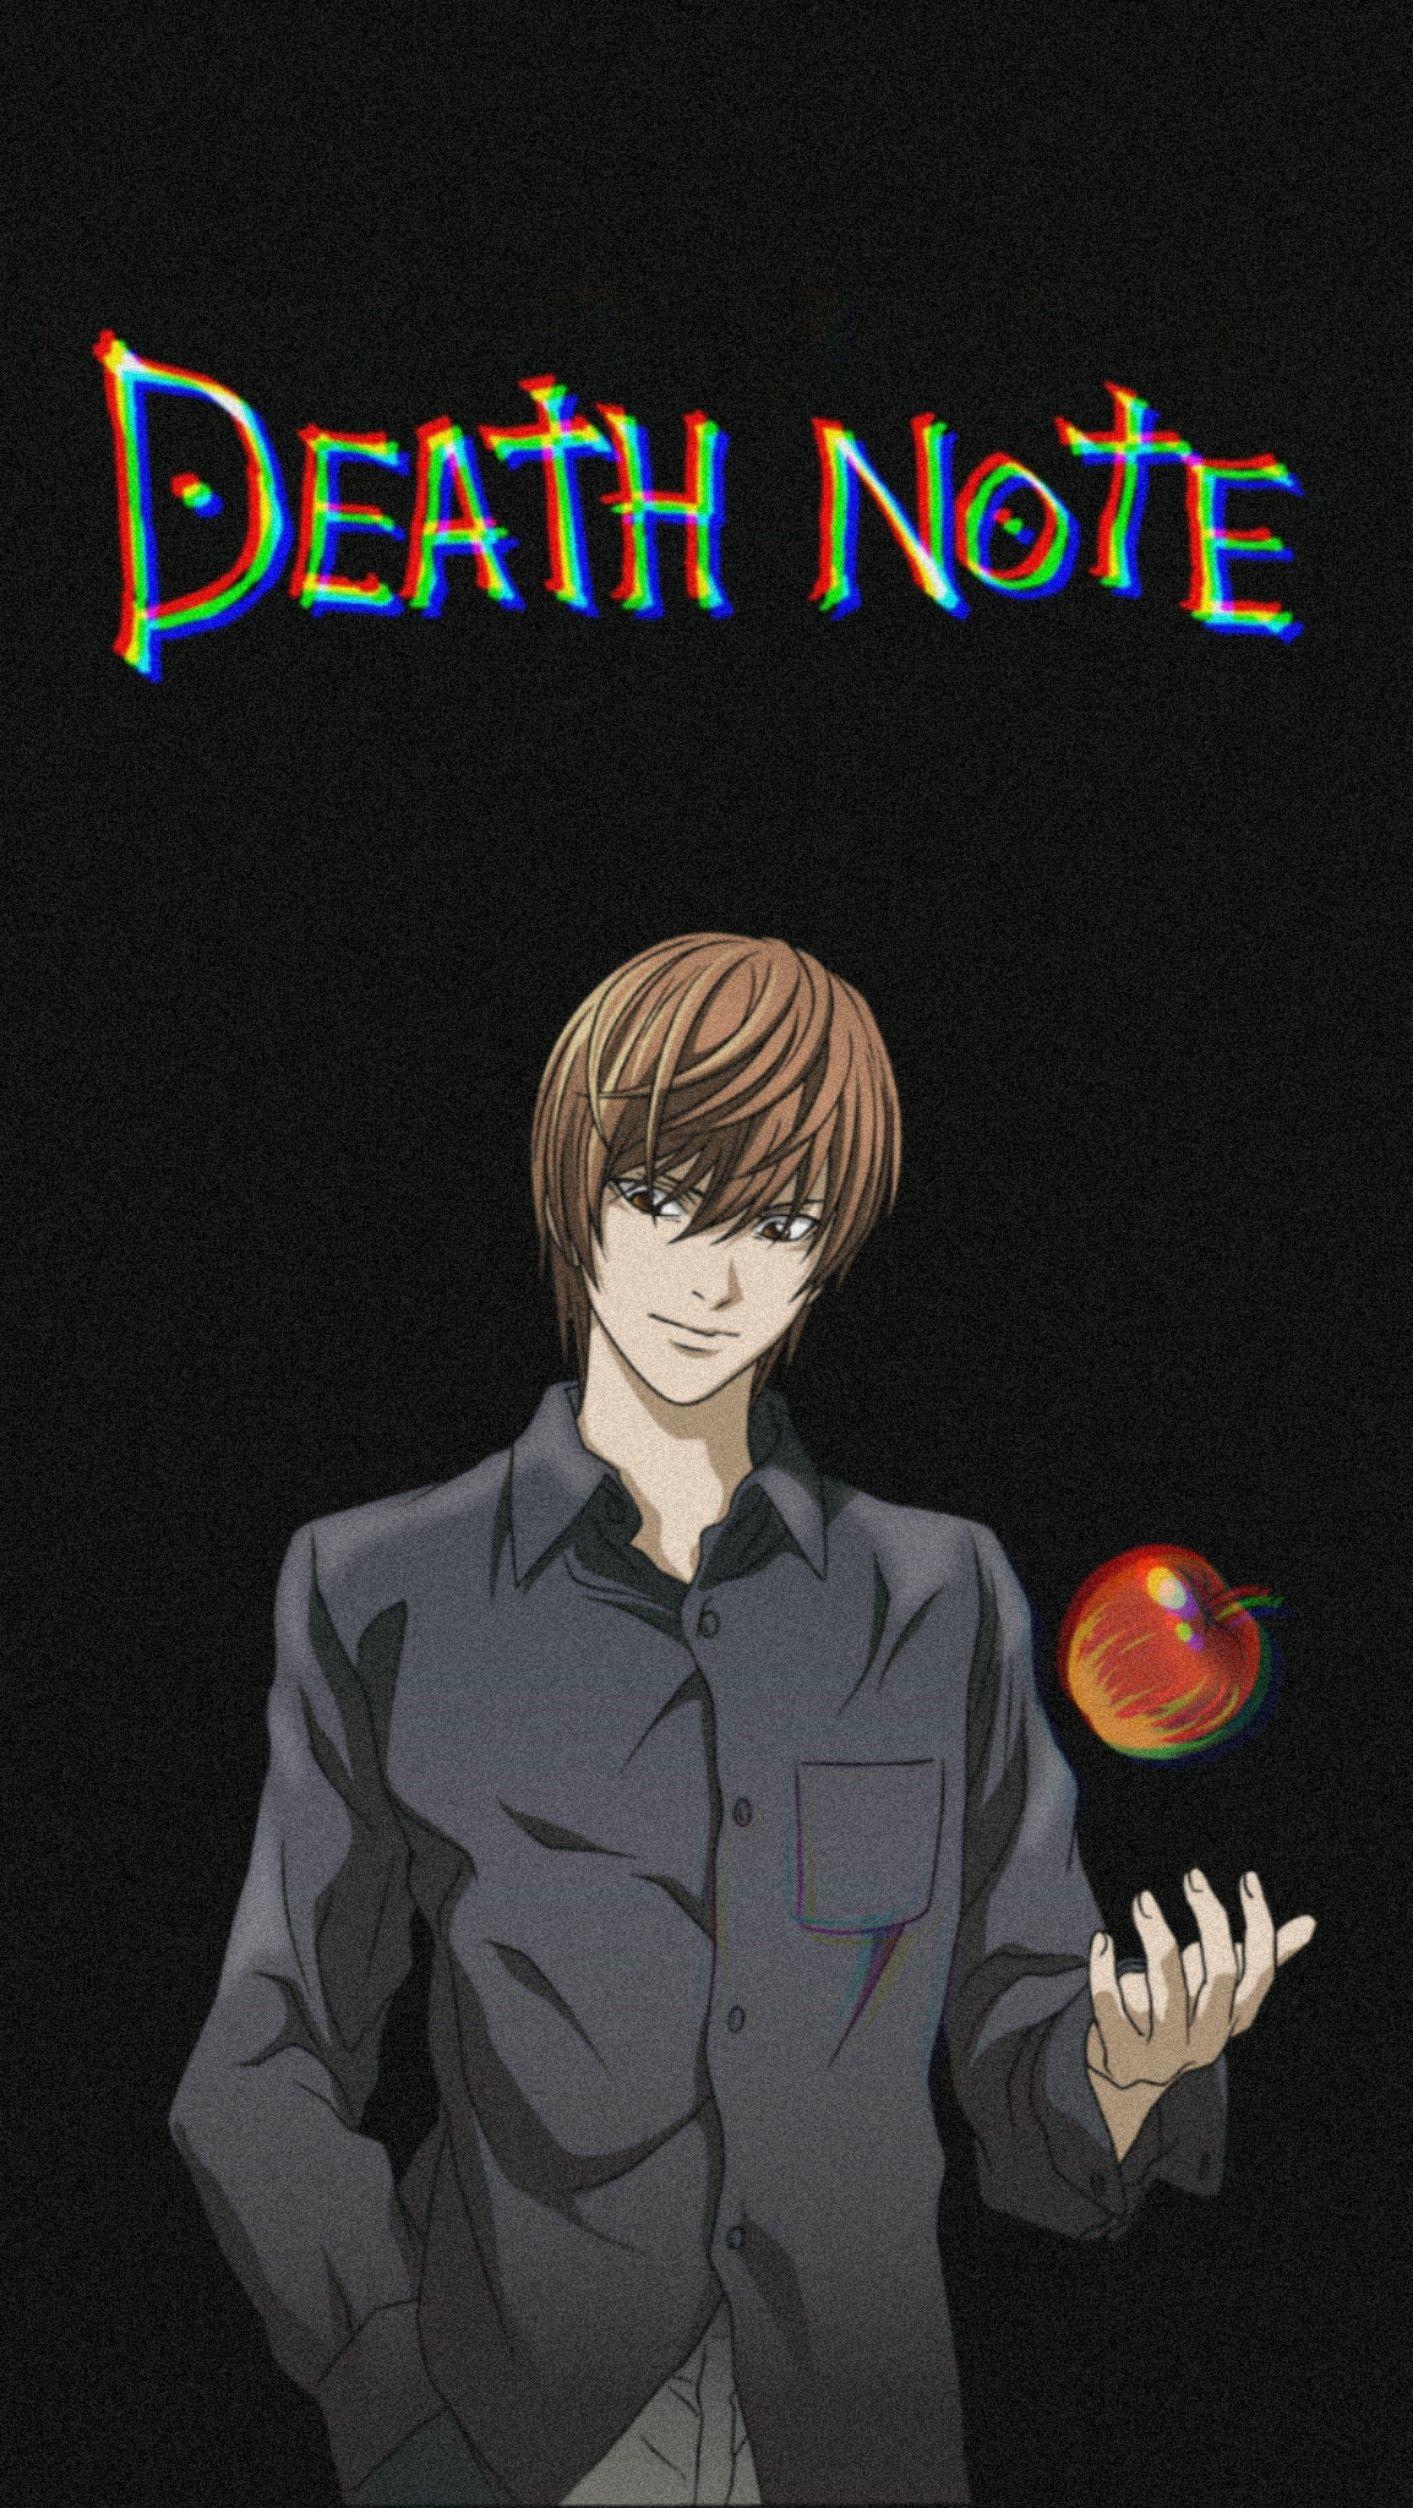 Pin De Eltaay Em Death Note Personagens De Anime Animes Wallpapers Anime